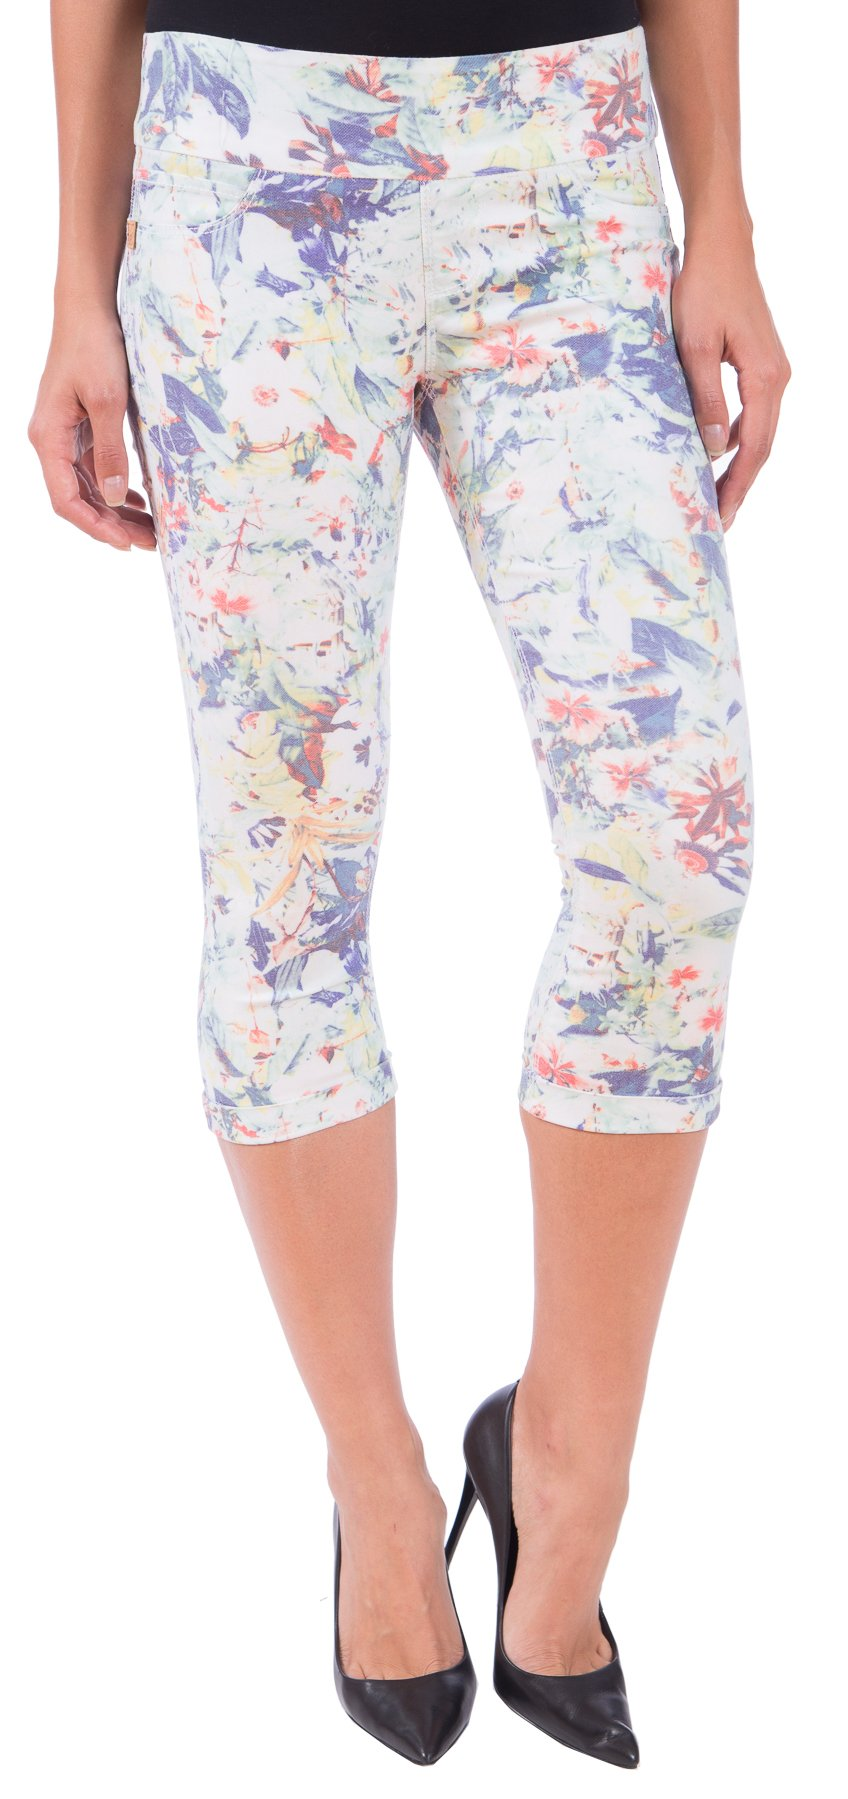 Lola Jeans Women's Michelle Mid Rise Pull On Capri Denim (Summer Paradise, 27/2)